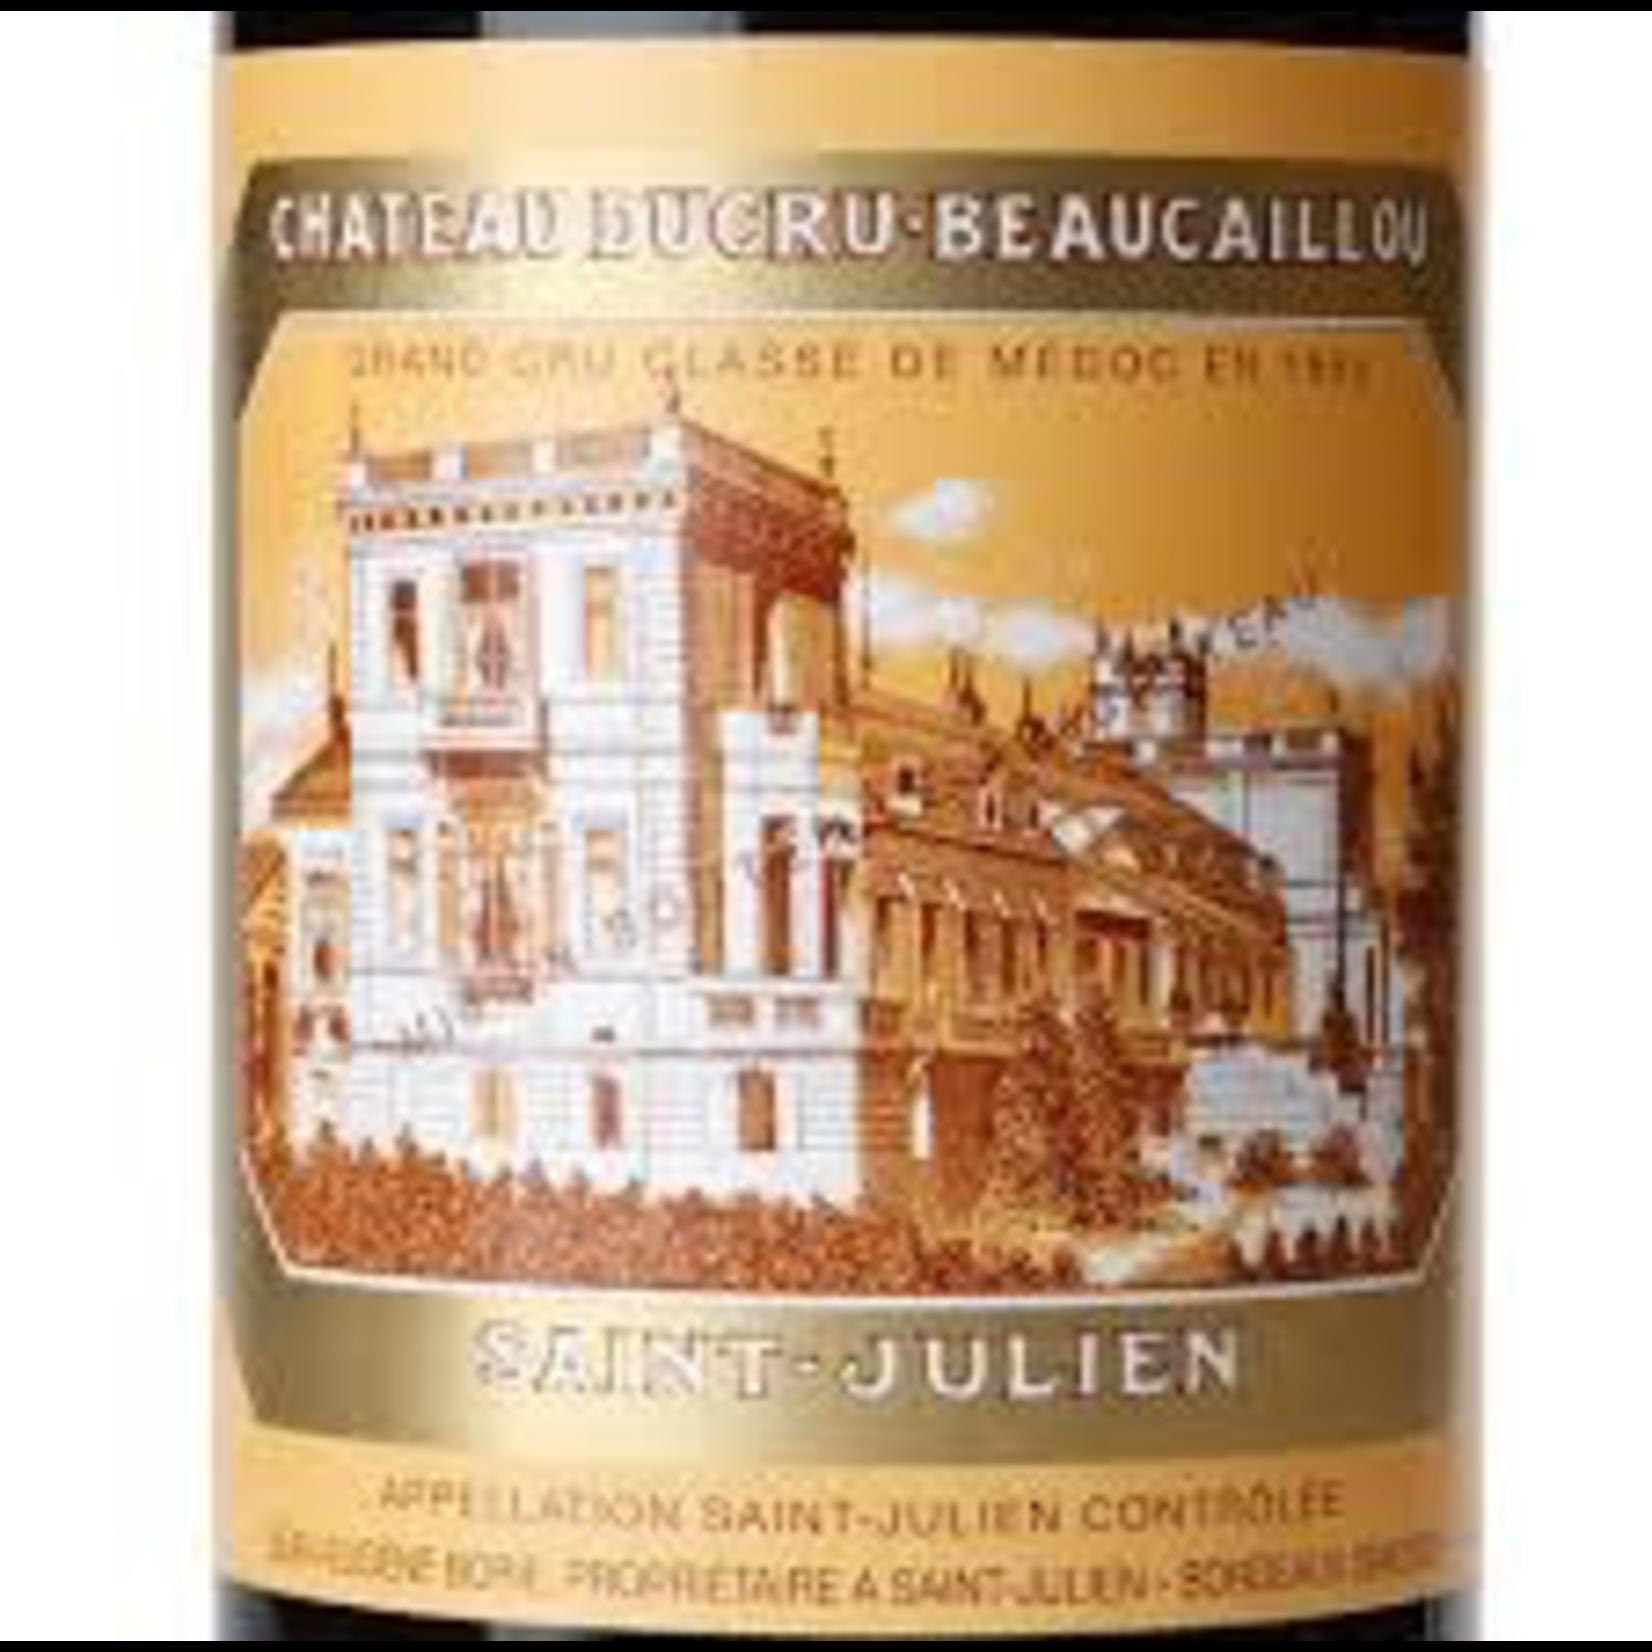 Wine Chateau Ducru Beaucaillou 1978